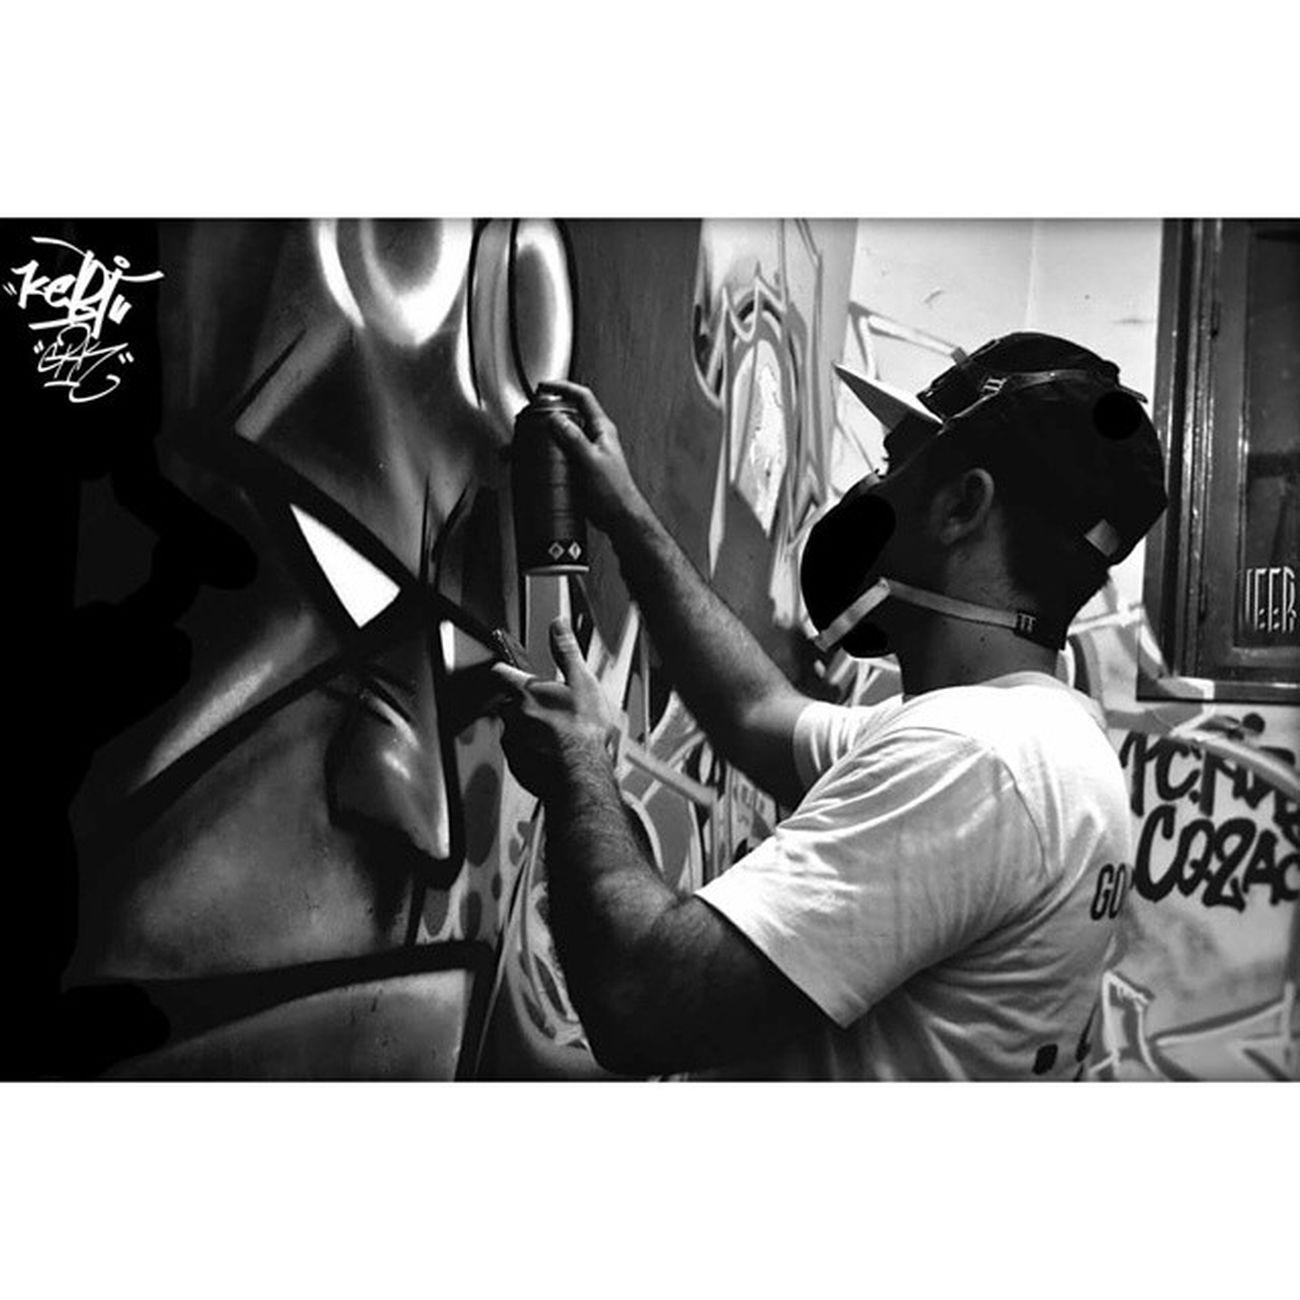 😈 HELL BOY 👤🎨 KEBI. Graffitiart Graffitiwall Graffiti Grkcrew Grkingz GRK Vandal Goldrushkingz